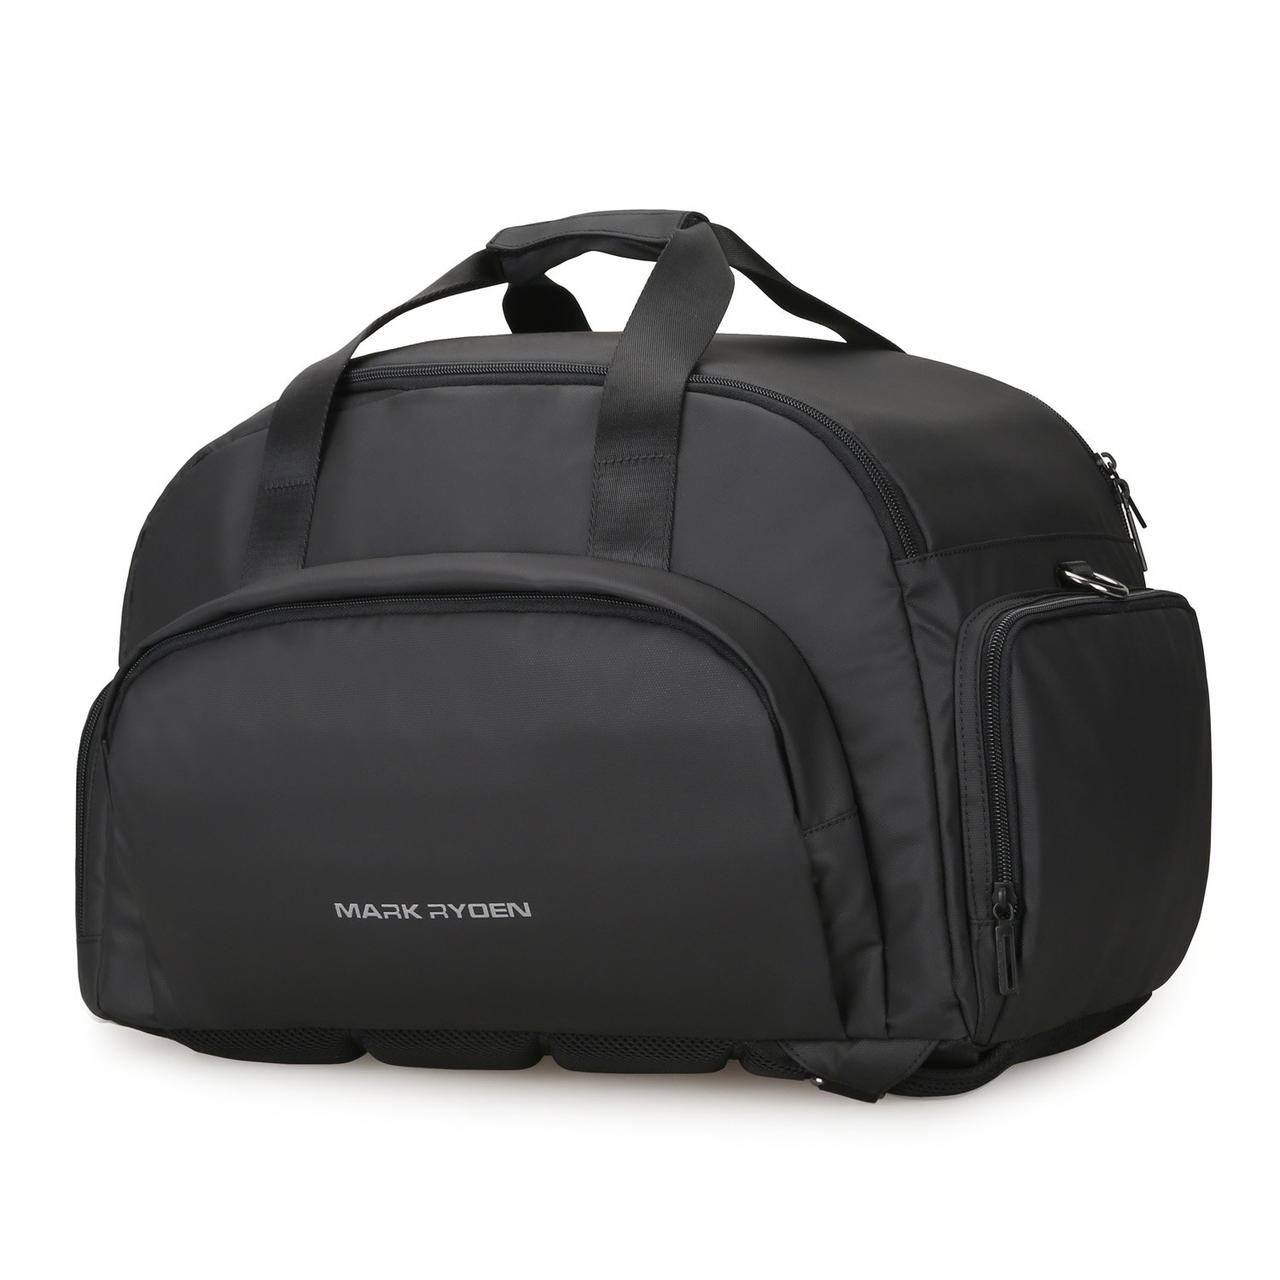 Дорожная сумка-рюкзак Mark Ryden Maxtravel MR7091 Black